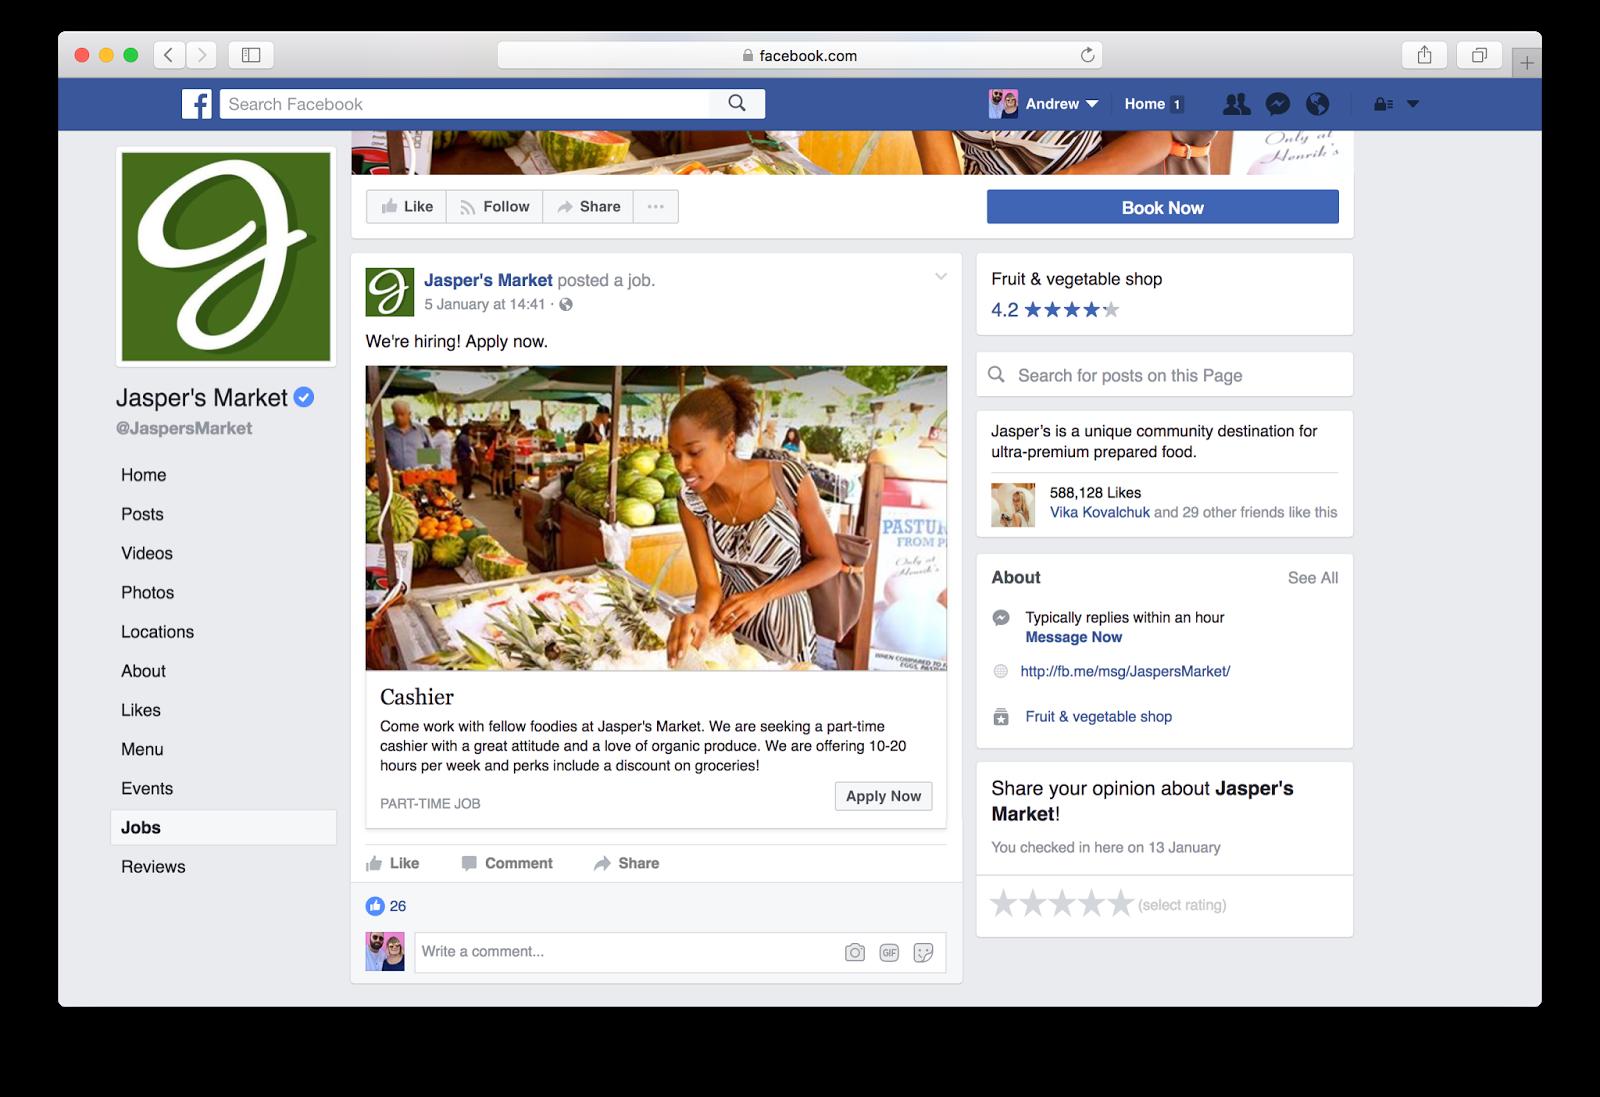 Una oferta ficticia de empleo en Facebook. FOTO: Facebook